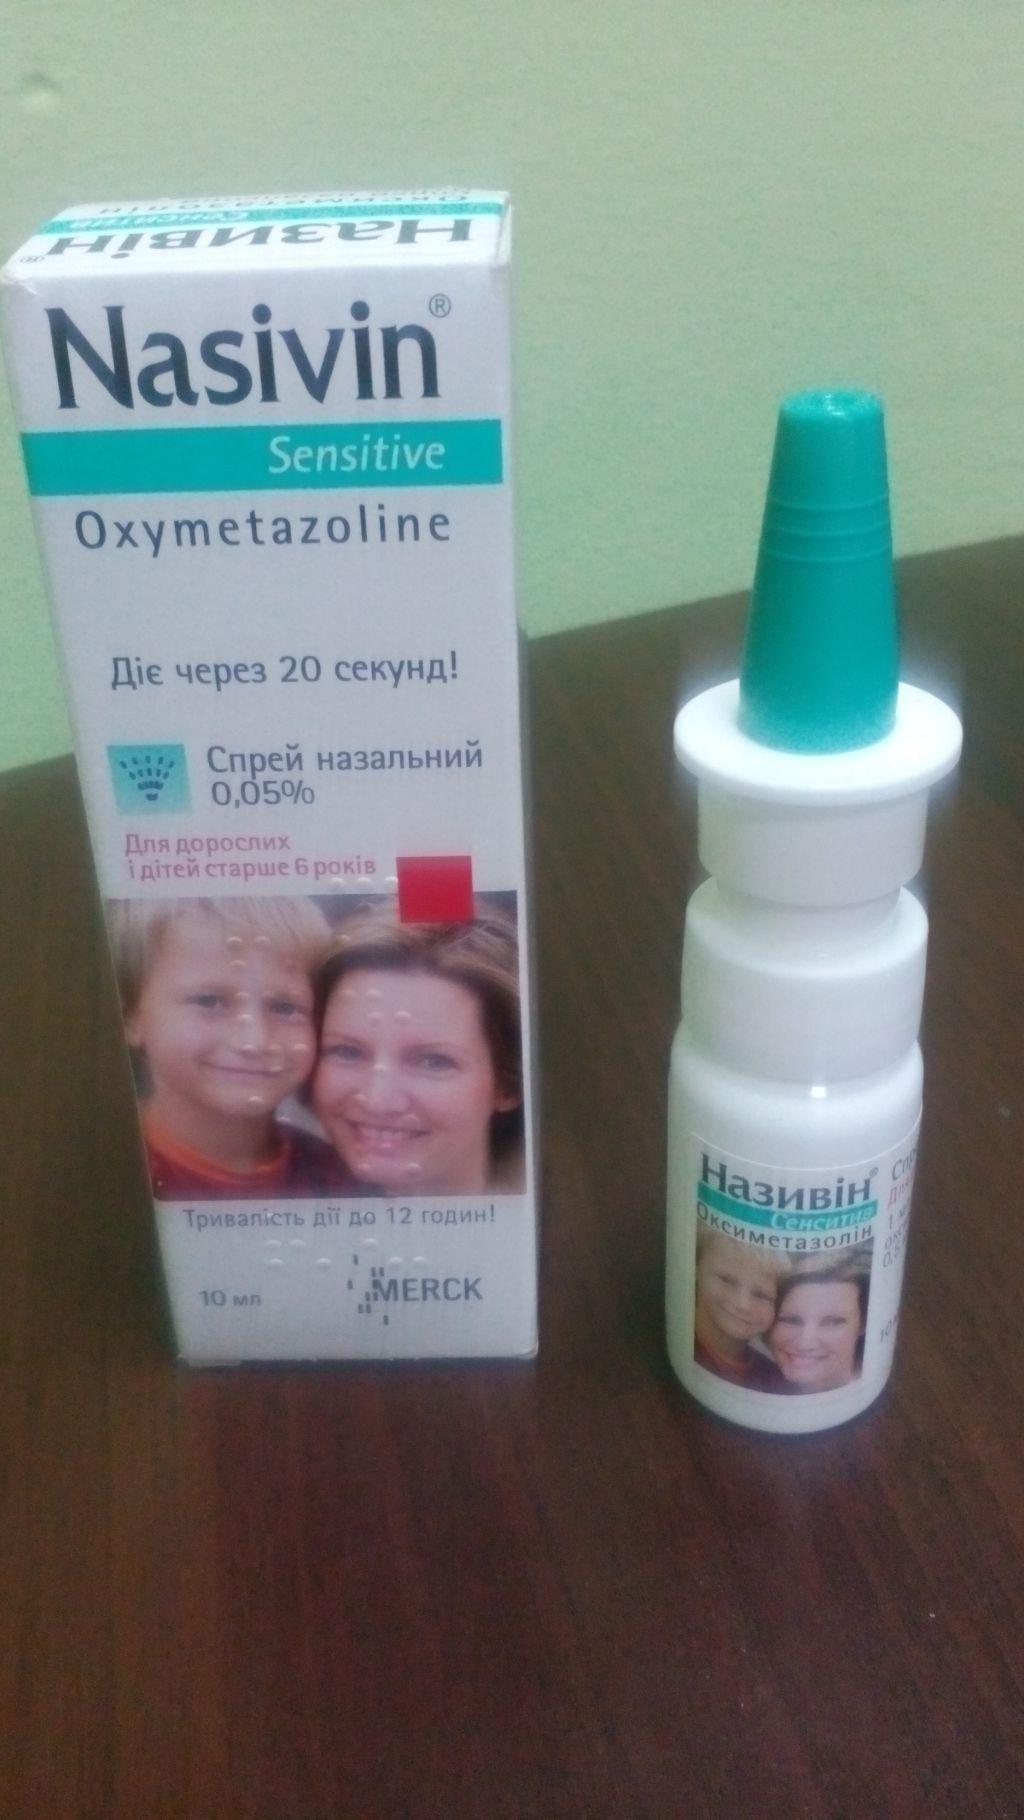 Називин Сенситив для лечения насморка